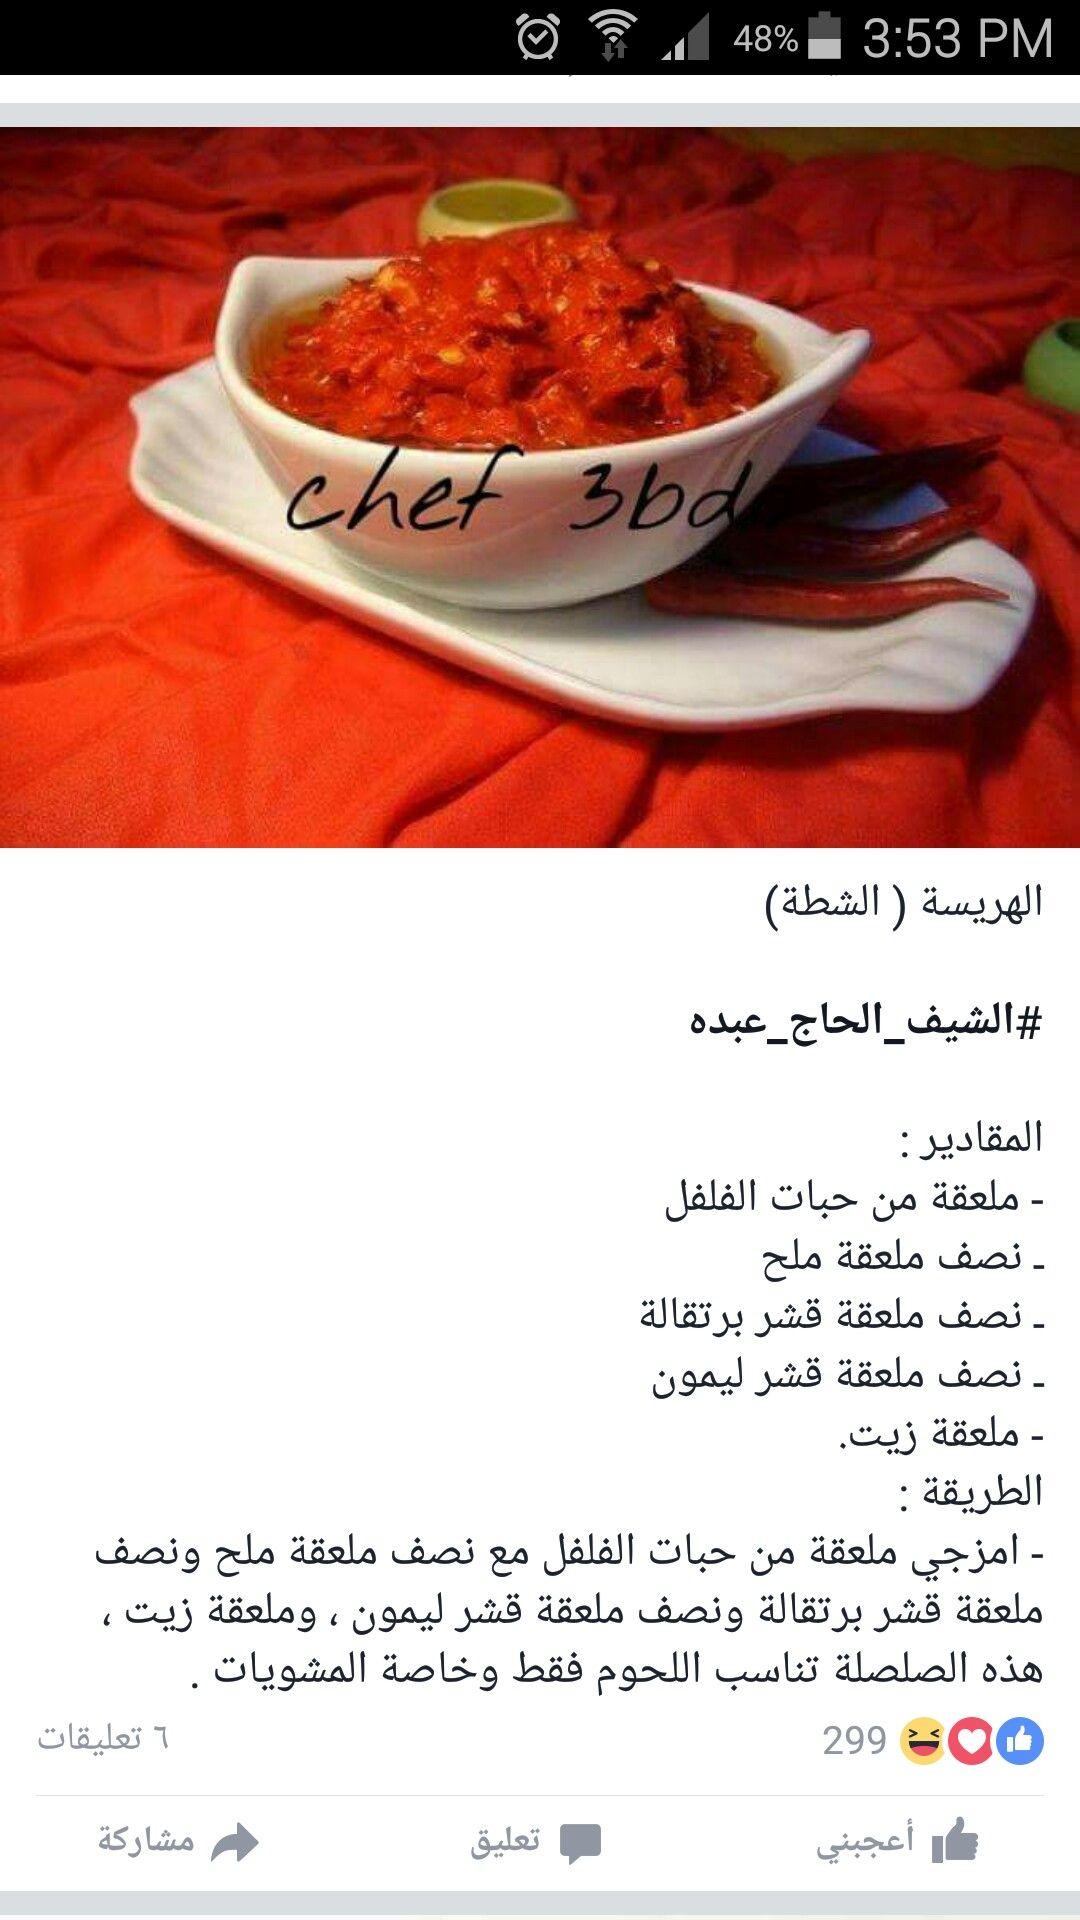 الهريسه الشطه Egyptian Food Recipes Tasty Dishes